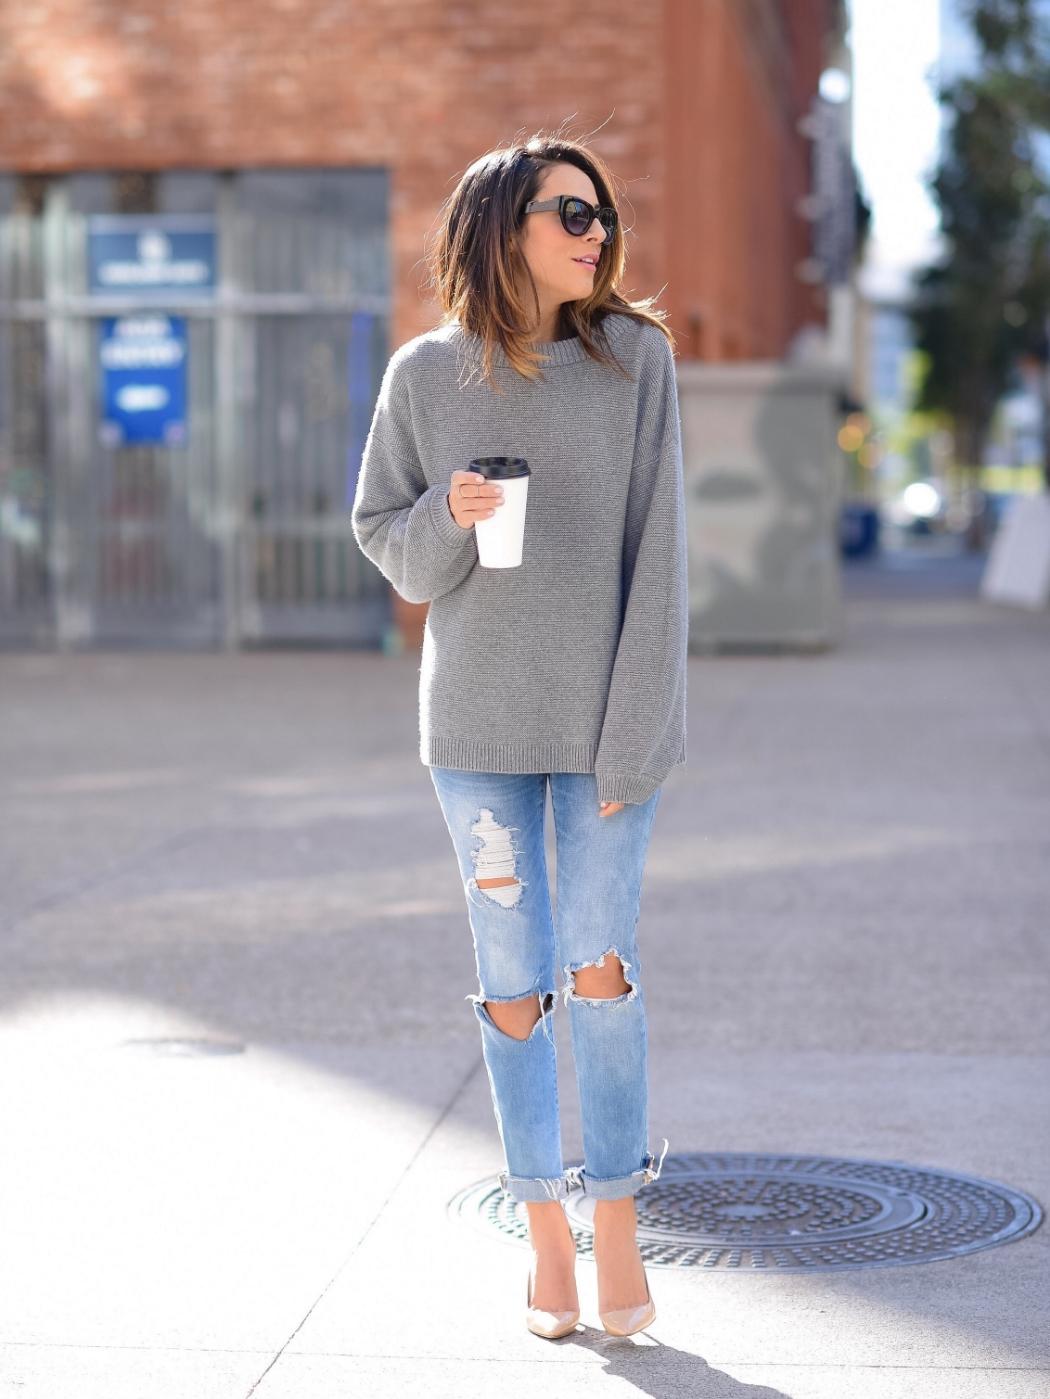 SimplyKasia_CustomJewelry_SanDiego_Fashion_FashionBlogger_LucysWhims_Streetstyle_BananaRepublic_BlankNYC_ManoloBlahnik.jpg